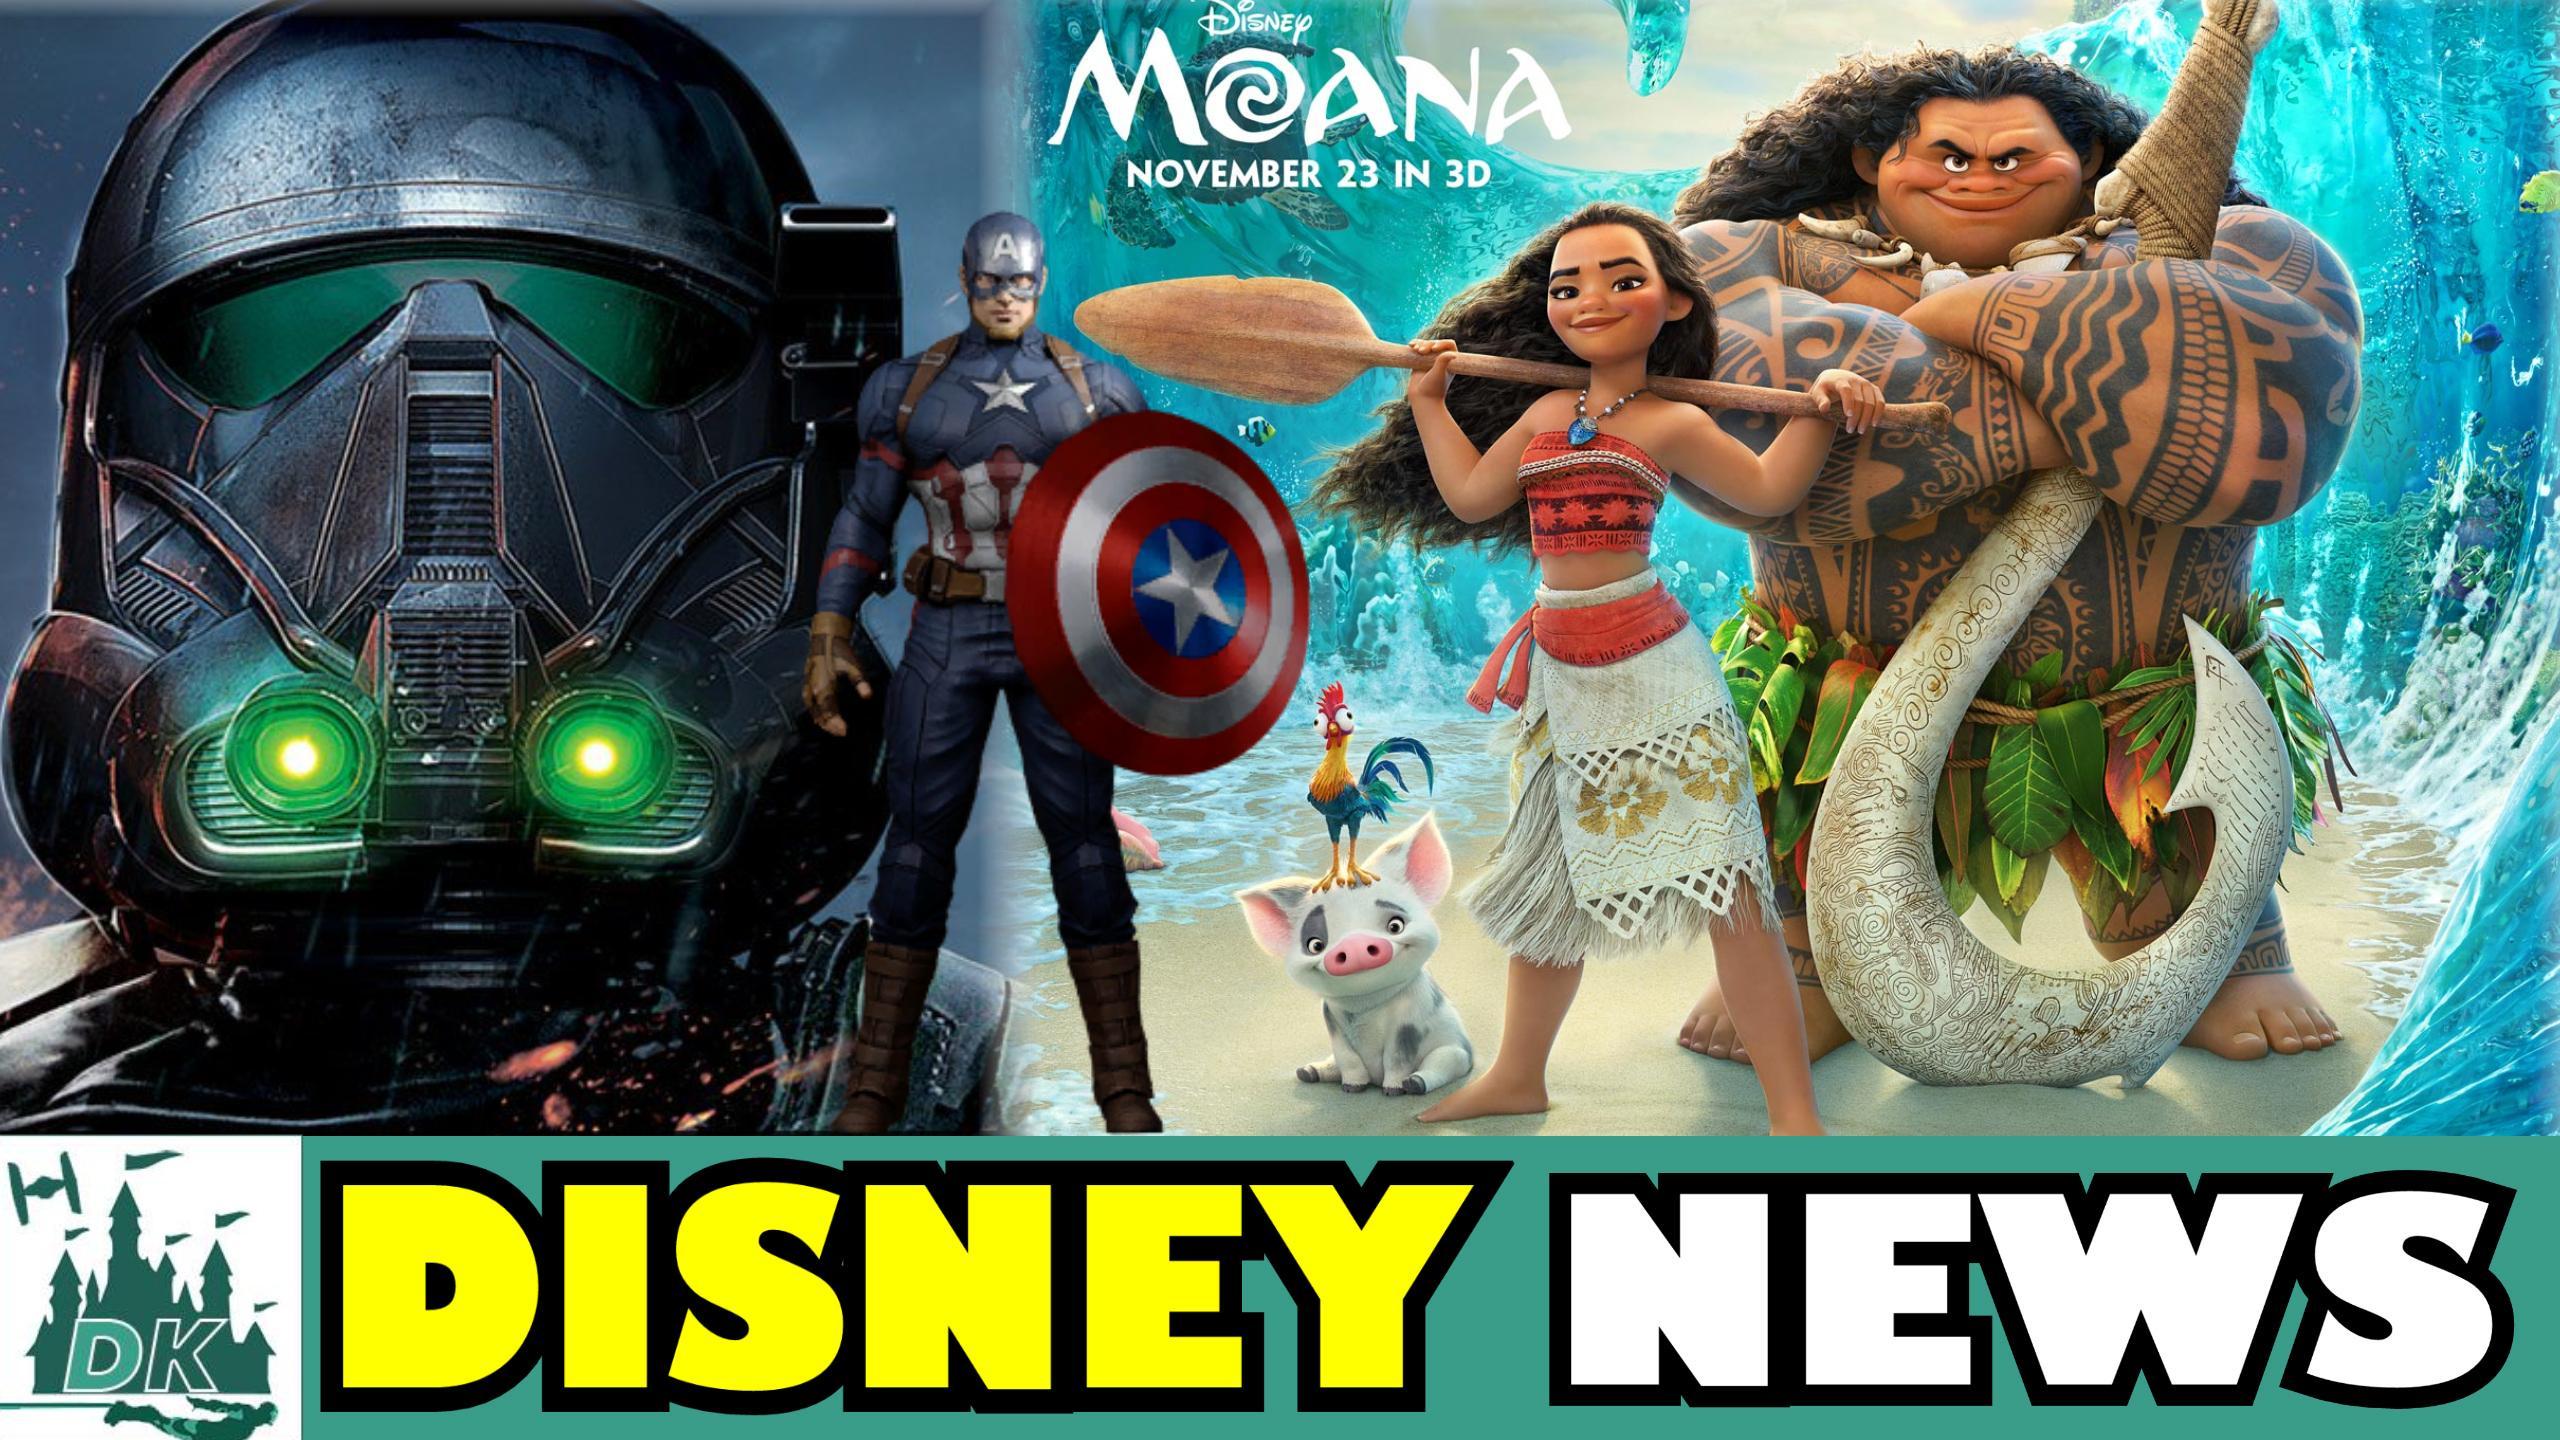 Moana Trailer Reaction + Rogue One Smuggler's Bounty Spoilers   DK Disney News